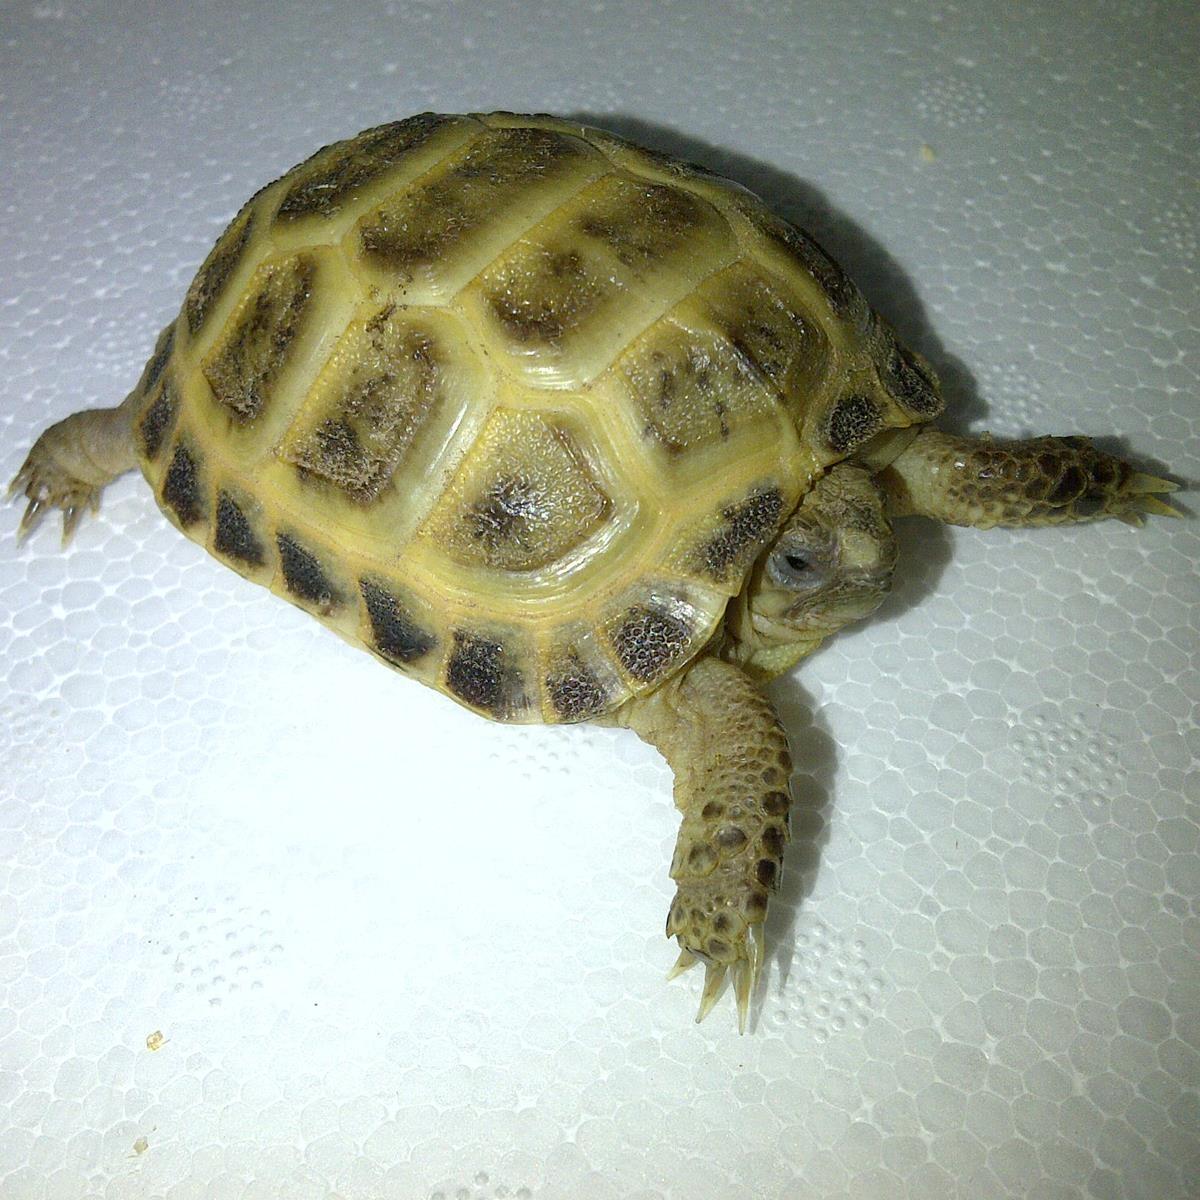 Captive Bred Tortoises Archives - Happy Tortoise Habitats